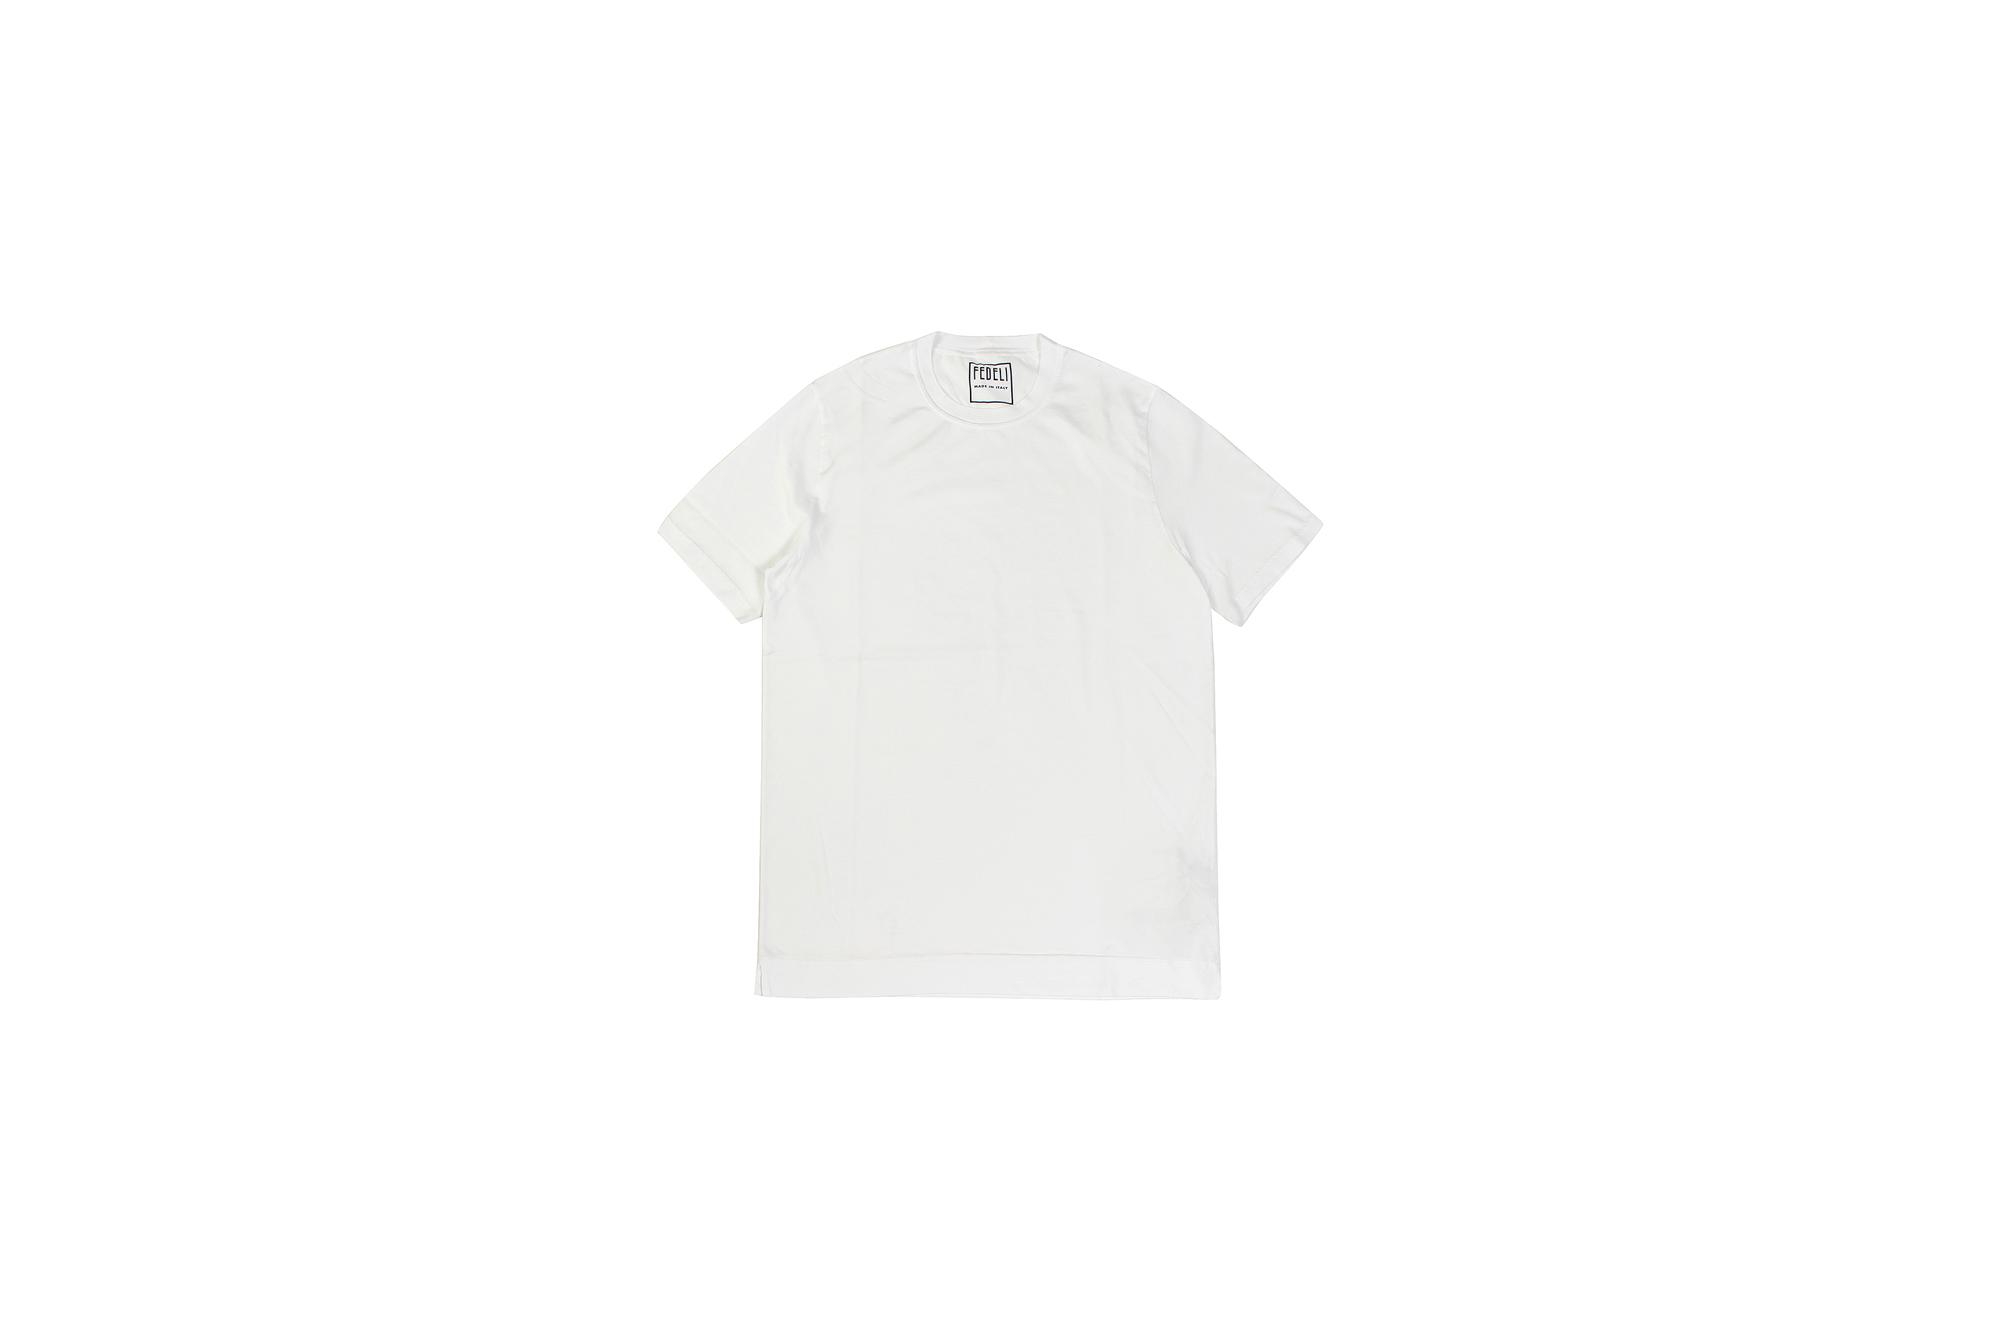 FEDELI(フェデーリ) Crew Neck T-shirt (クルーネック Tシャツ) ギザコットン Tシャツ WHITE (ホワイト・41) made in italy (イタリア製) 2020 春夏 【ご予約開始】愛知 名古屋 altoediritto アルトエデリット TEE